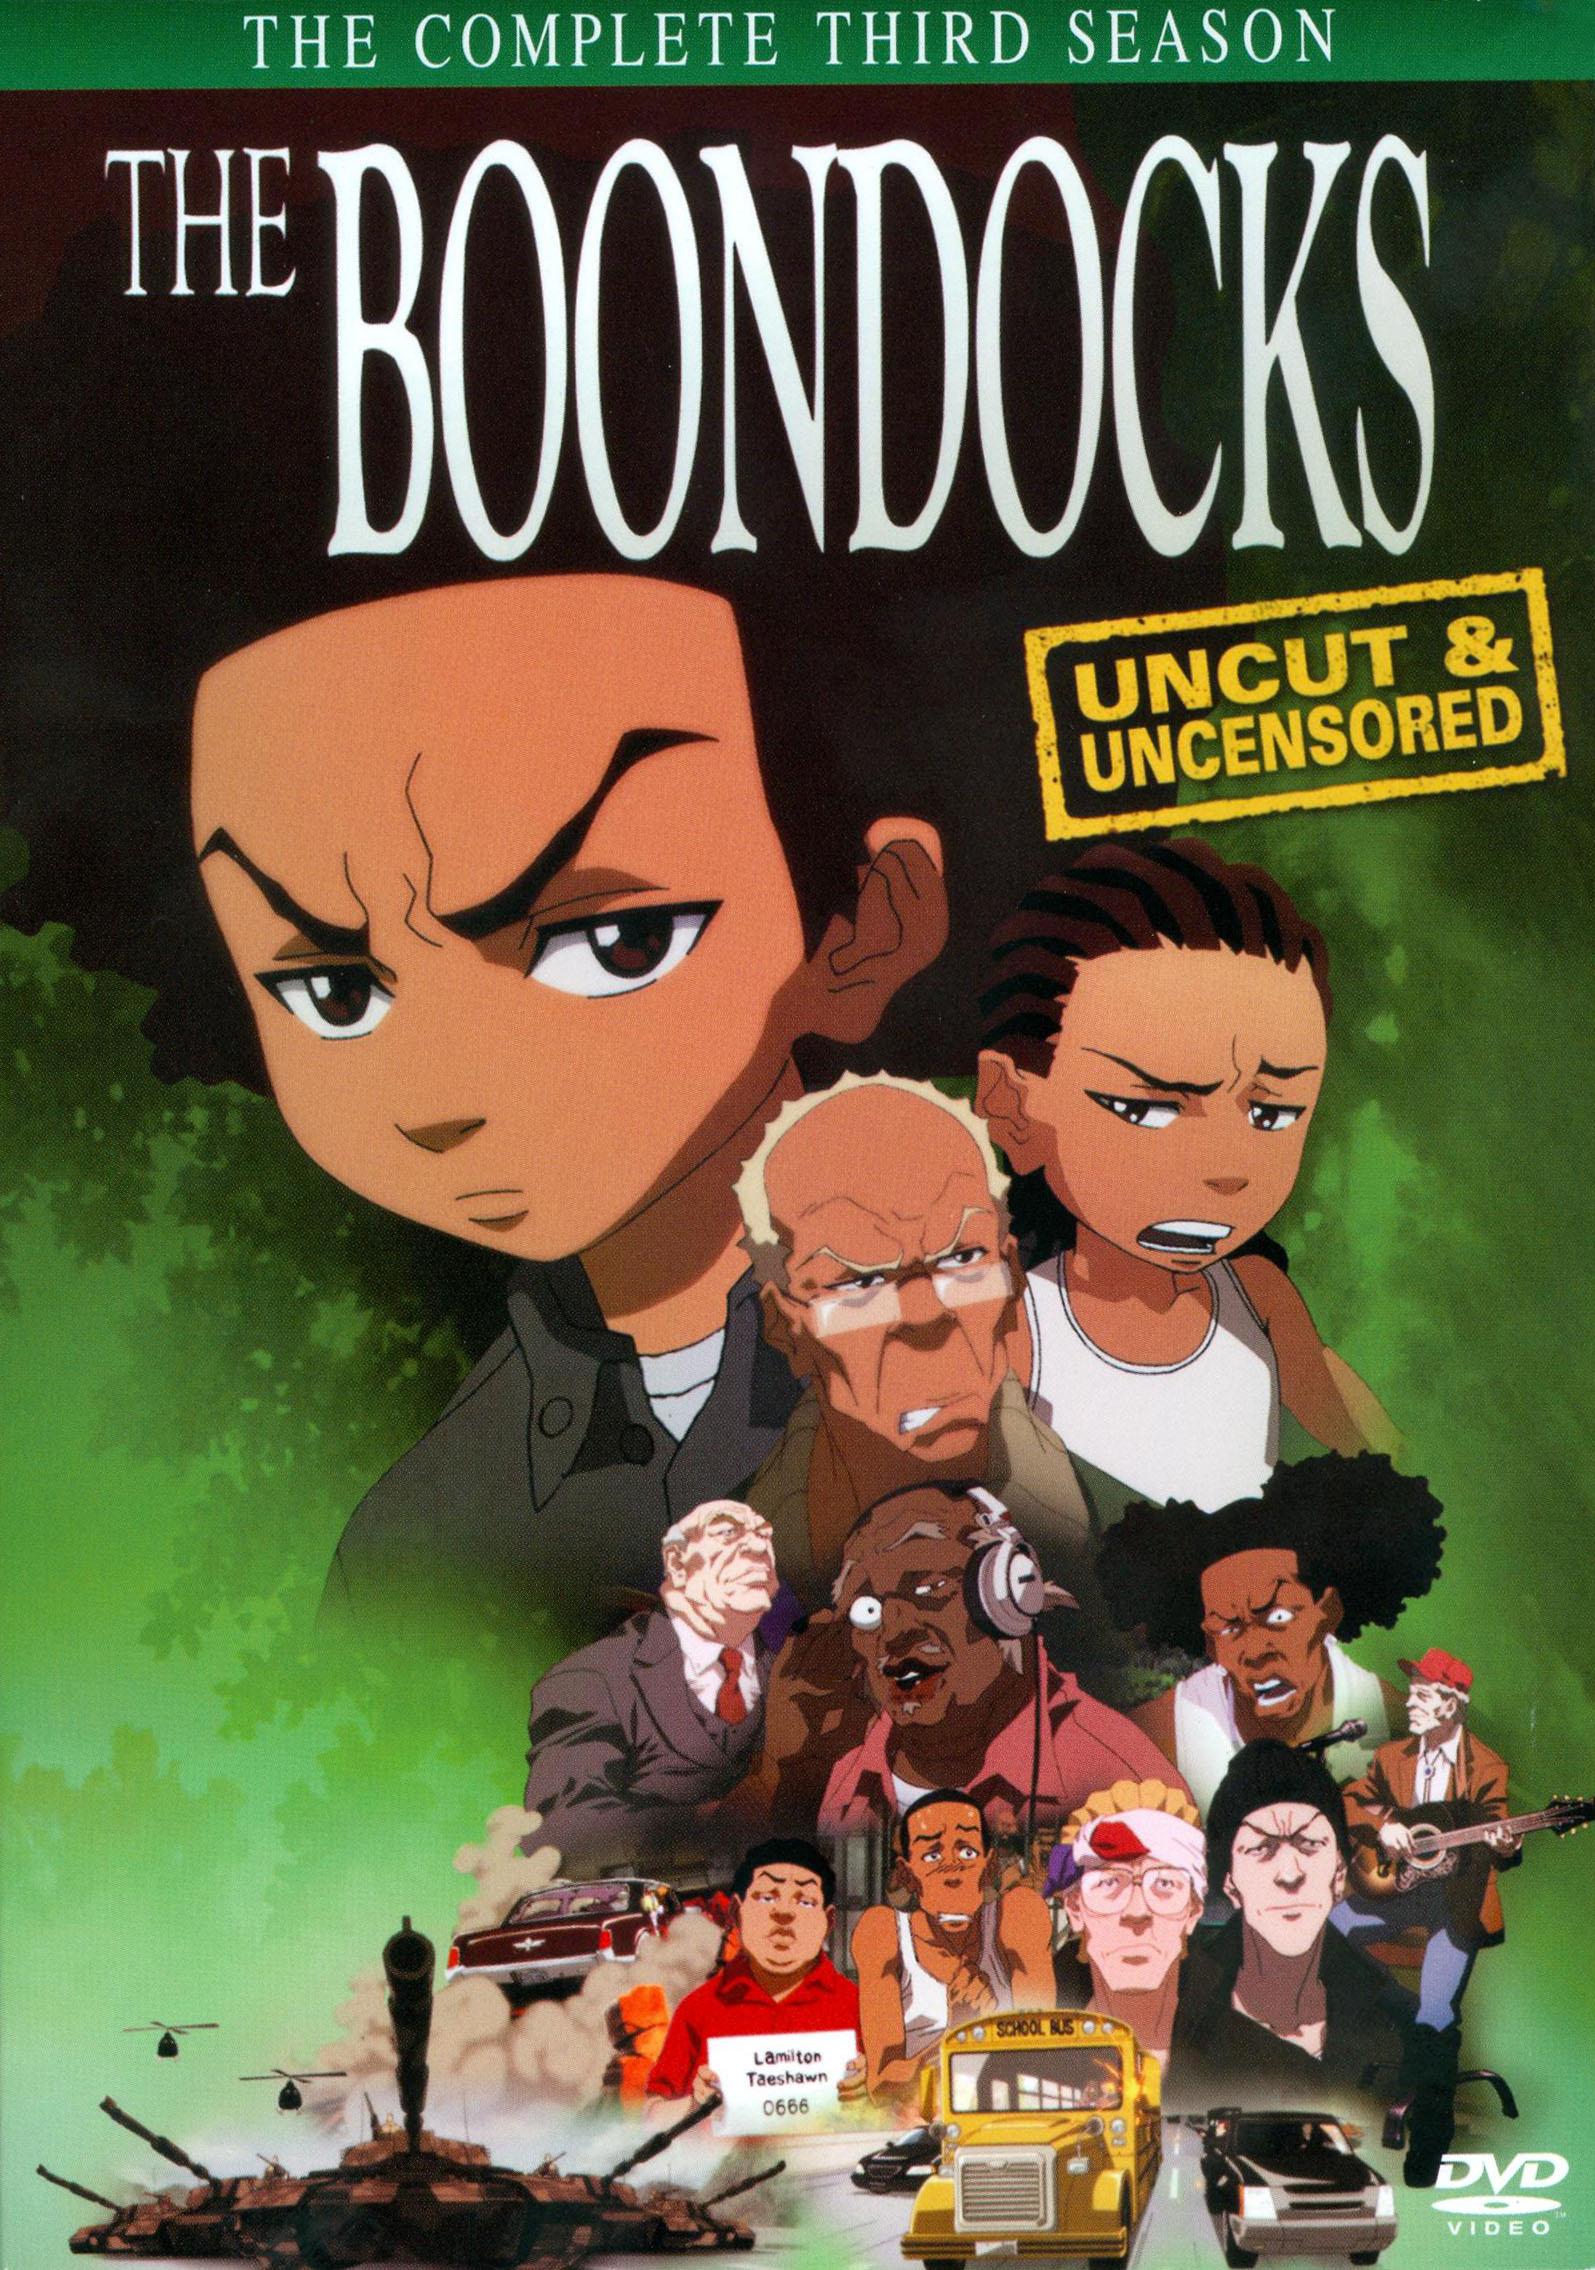 The Boondocks: The Complete Third Season [3 Discs] (dvd) 1380679